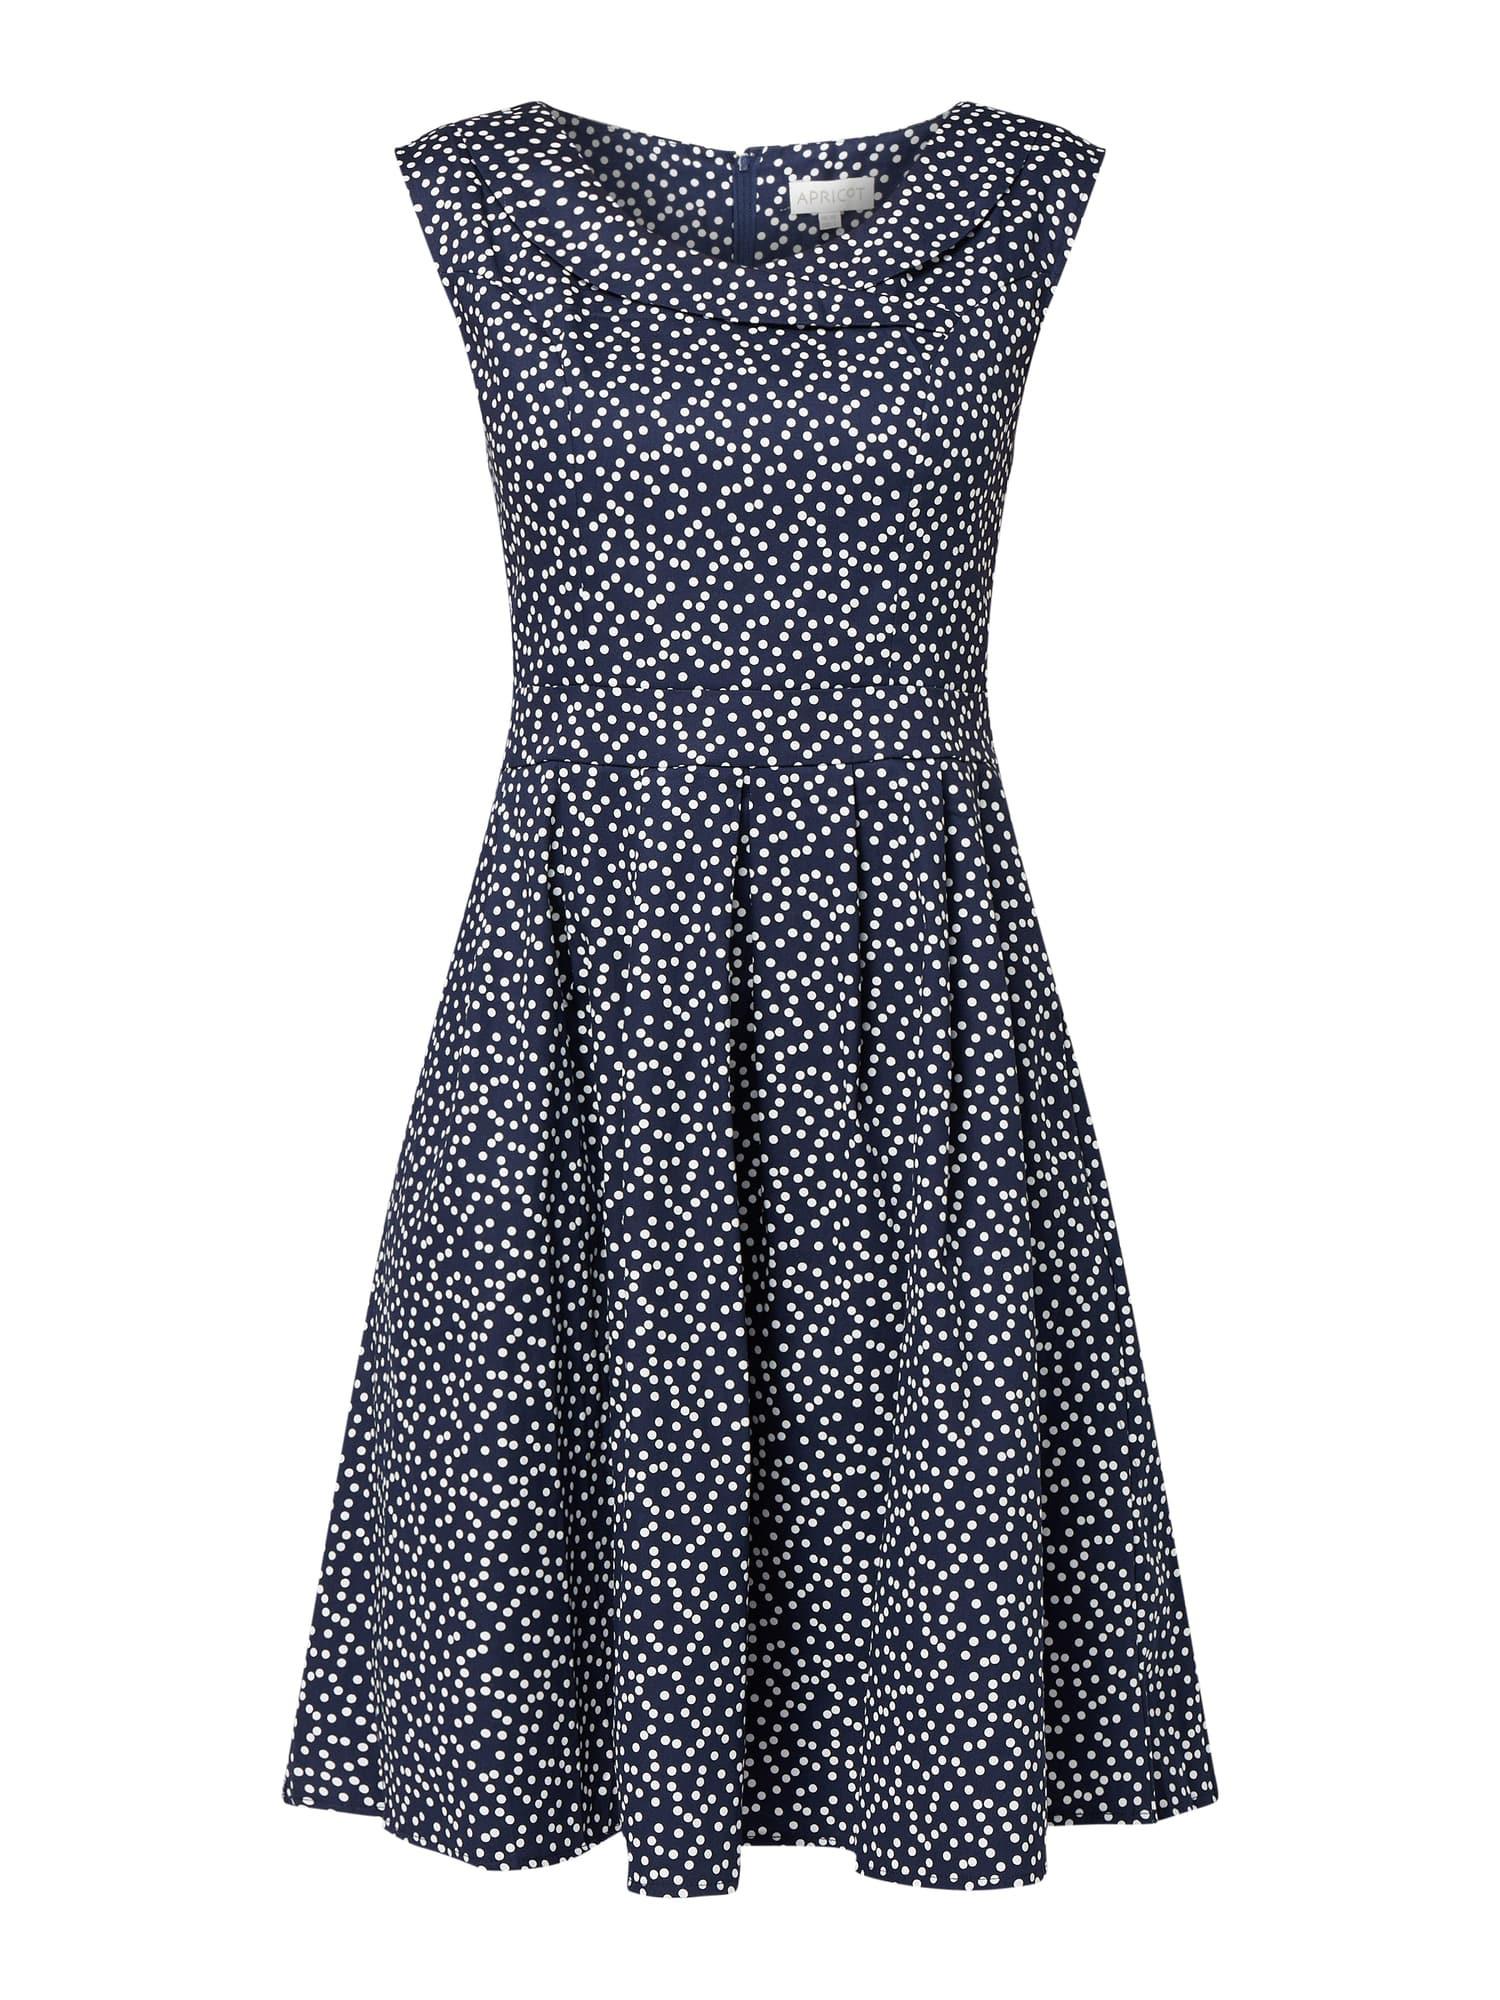 Apricot Kleid Mit Umgelegtem Kragen In Blau / Türkis